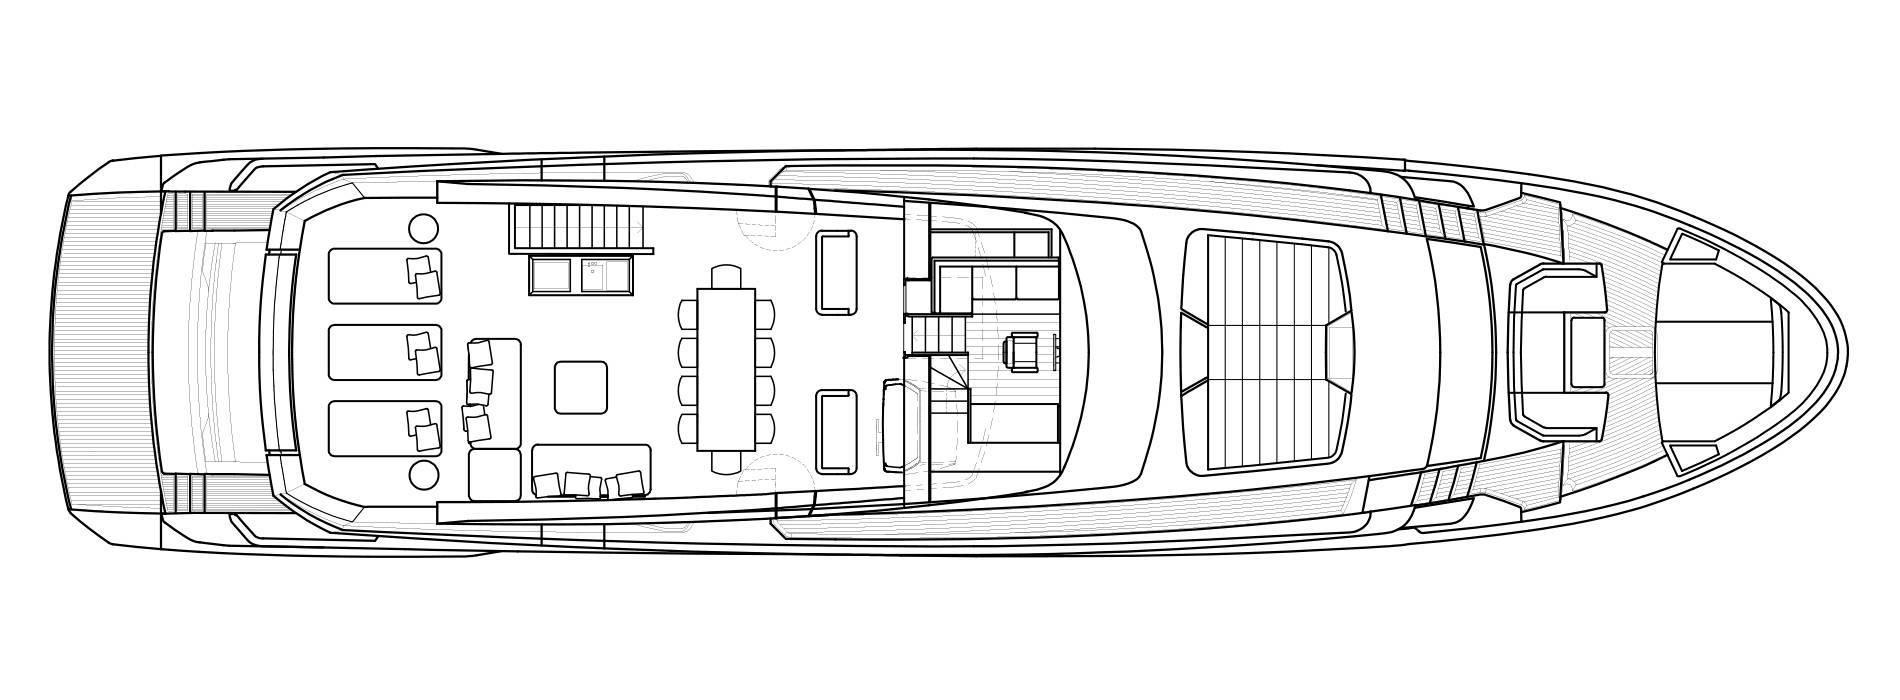 Sanlorenzo Yachts SL102 Флайбридж